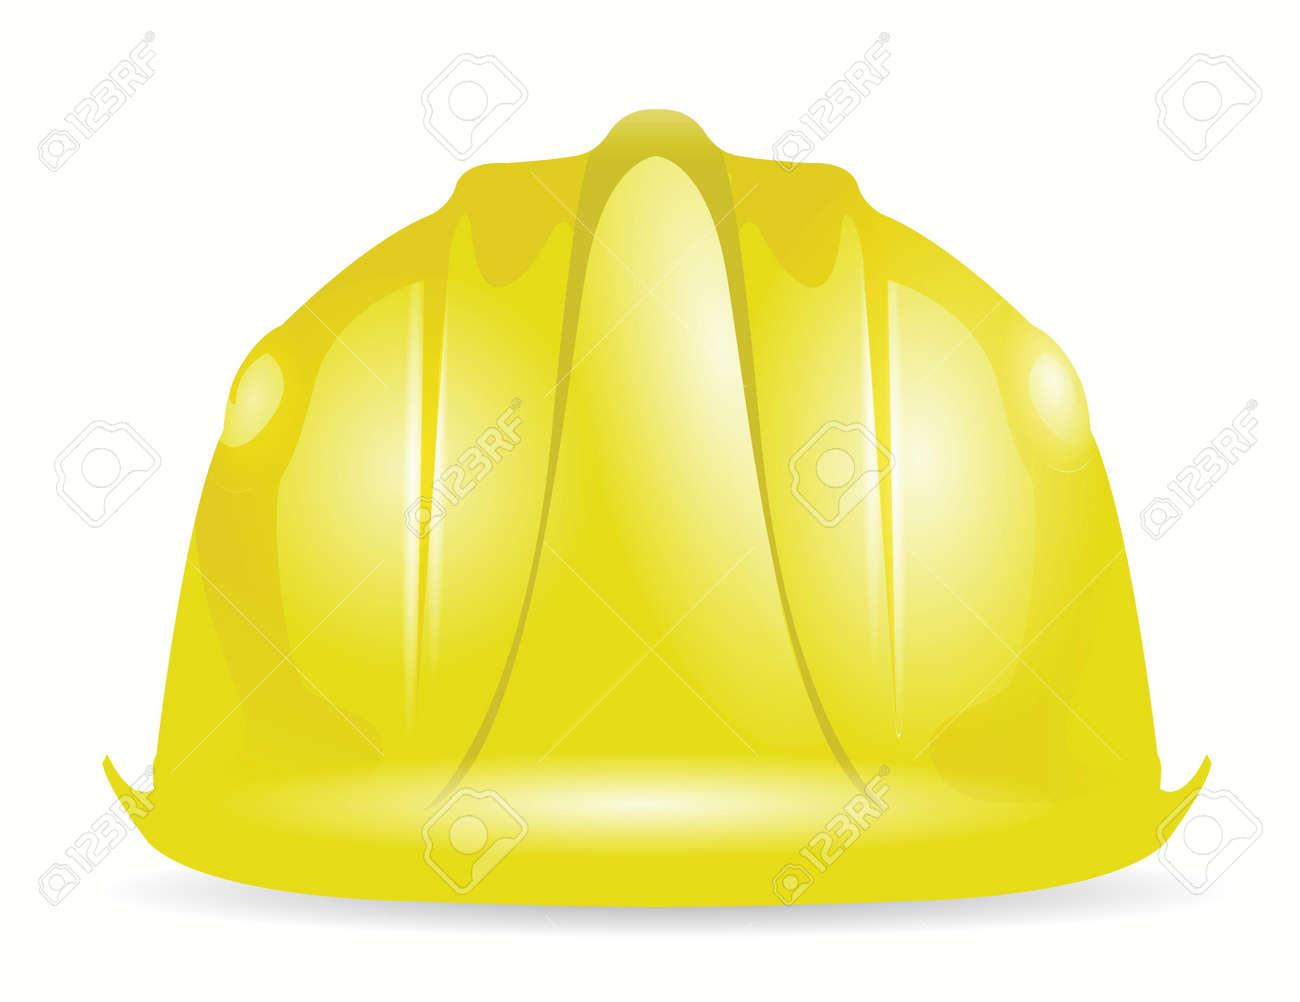 construction helmet illustration design over a white background Stock Vector - 18806055